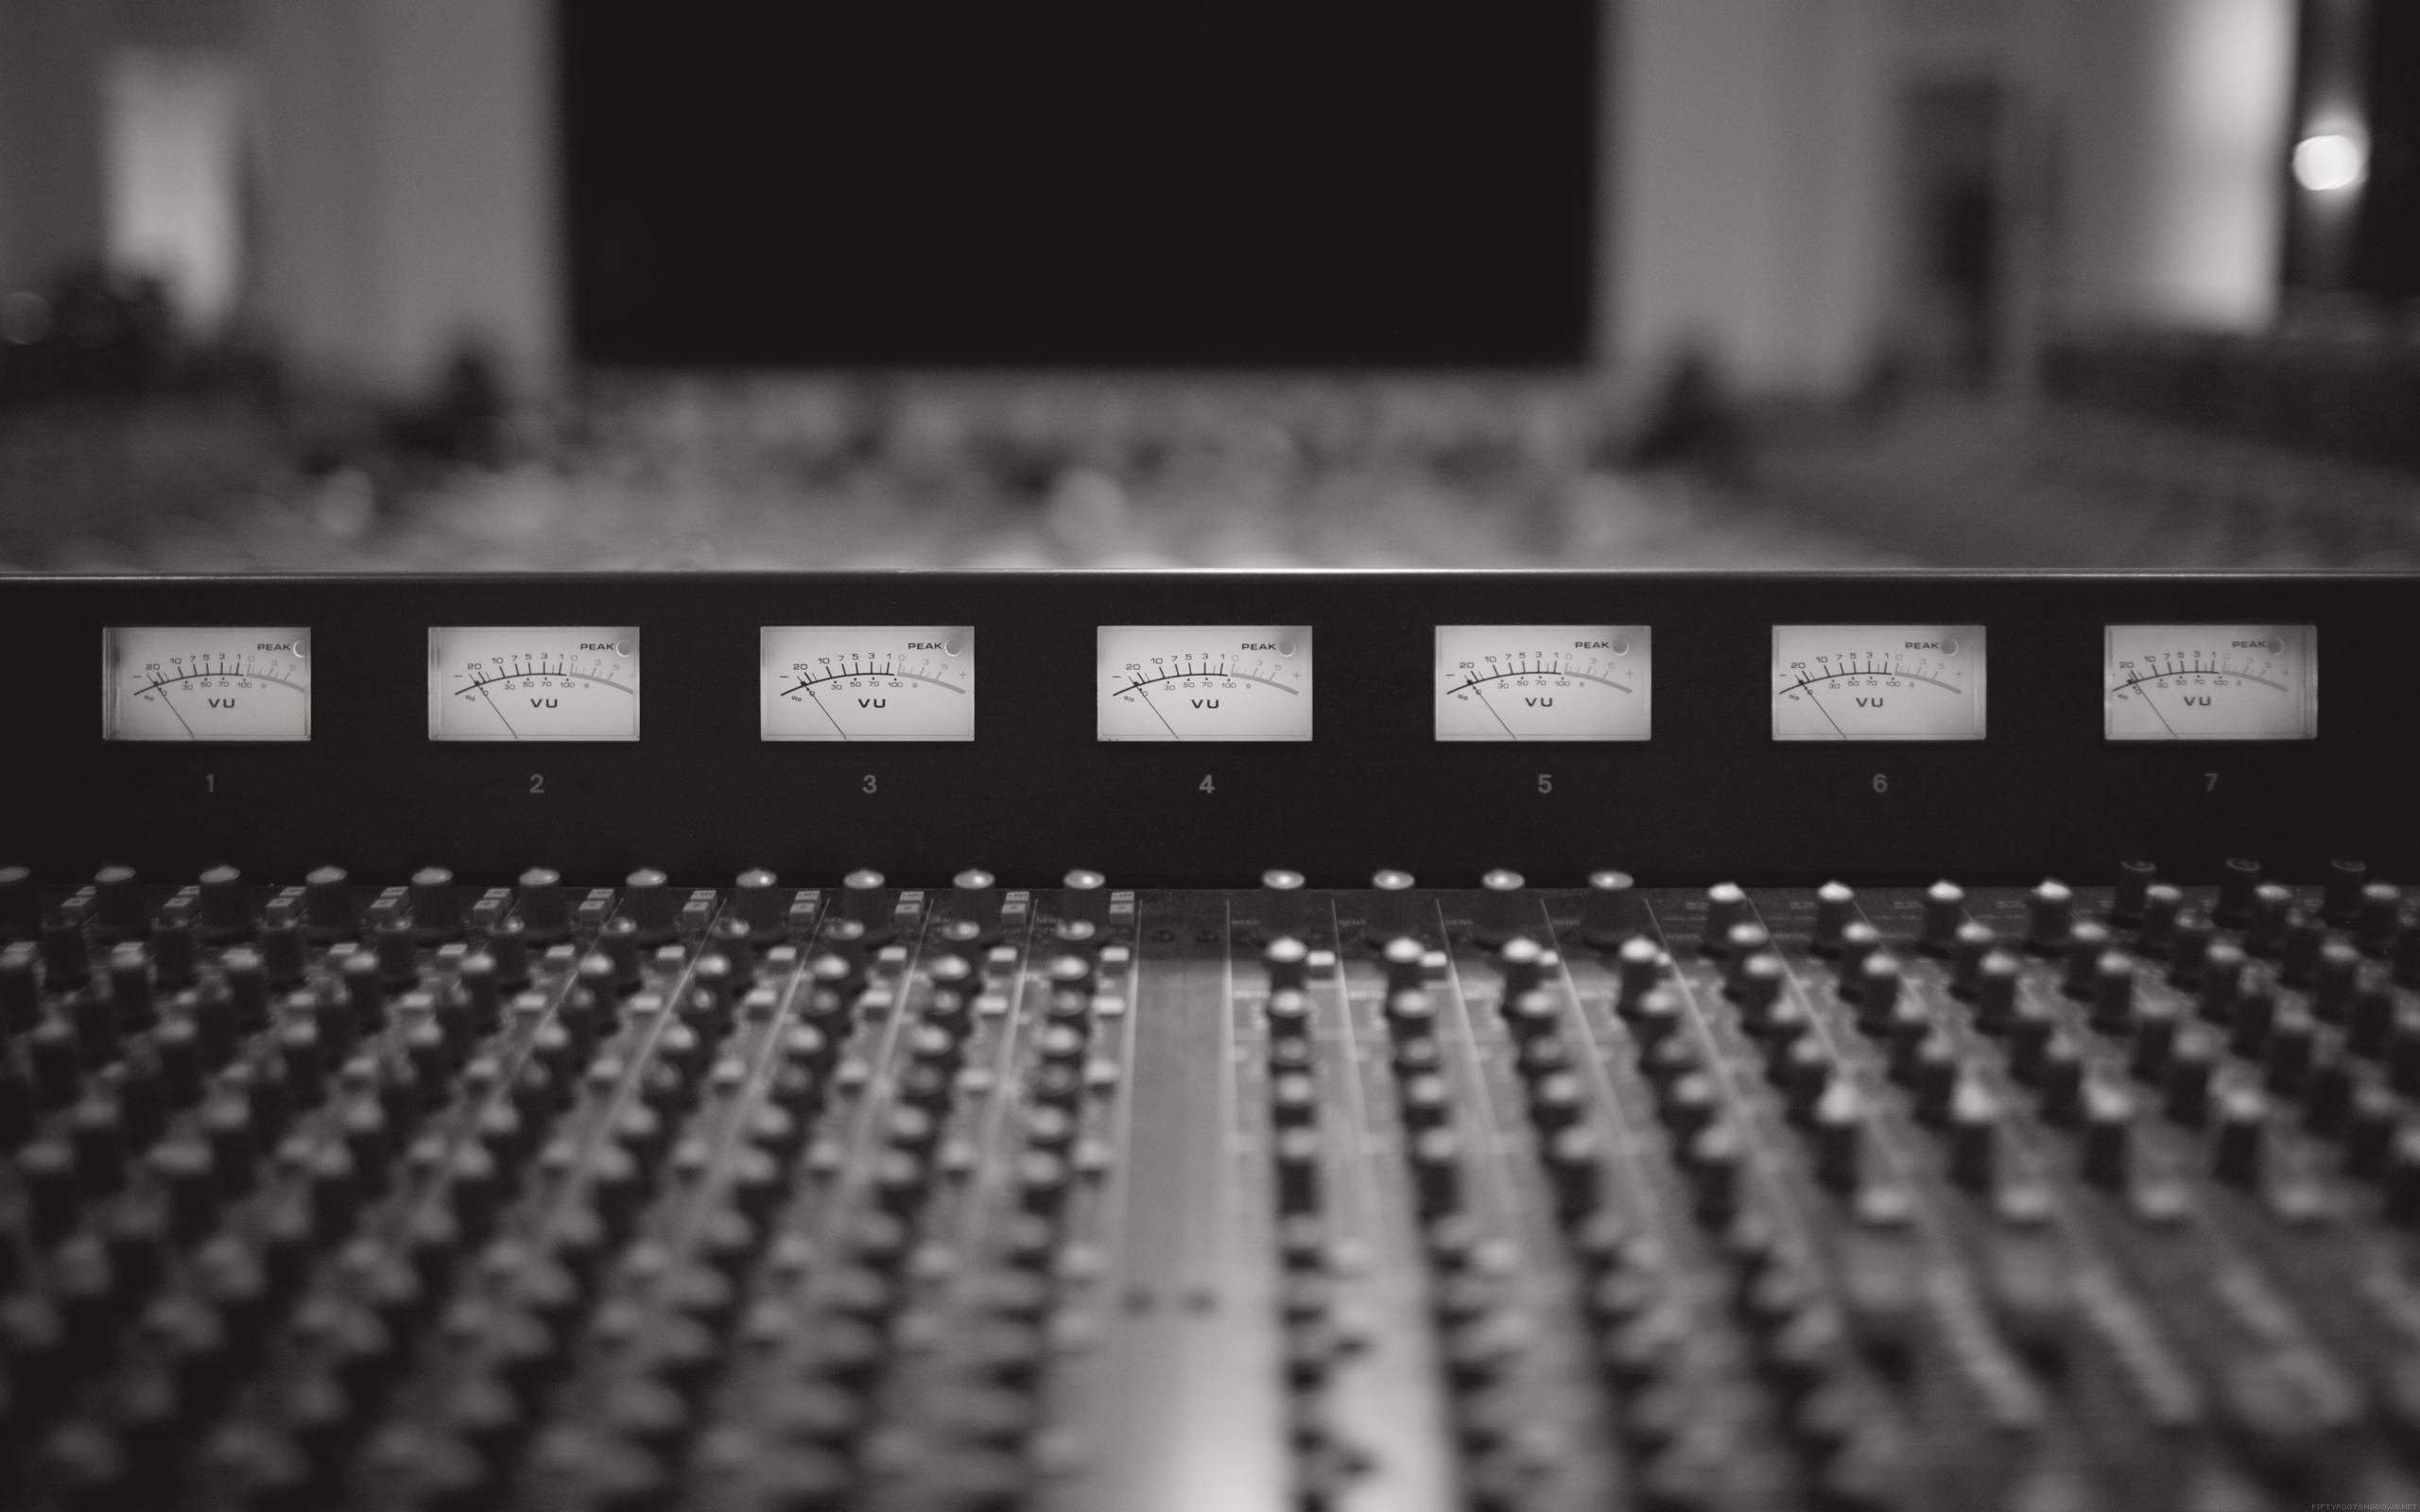 Recording studio wallpaper   SF Wallpaper 2560x1600